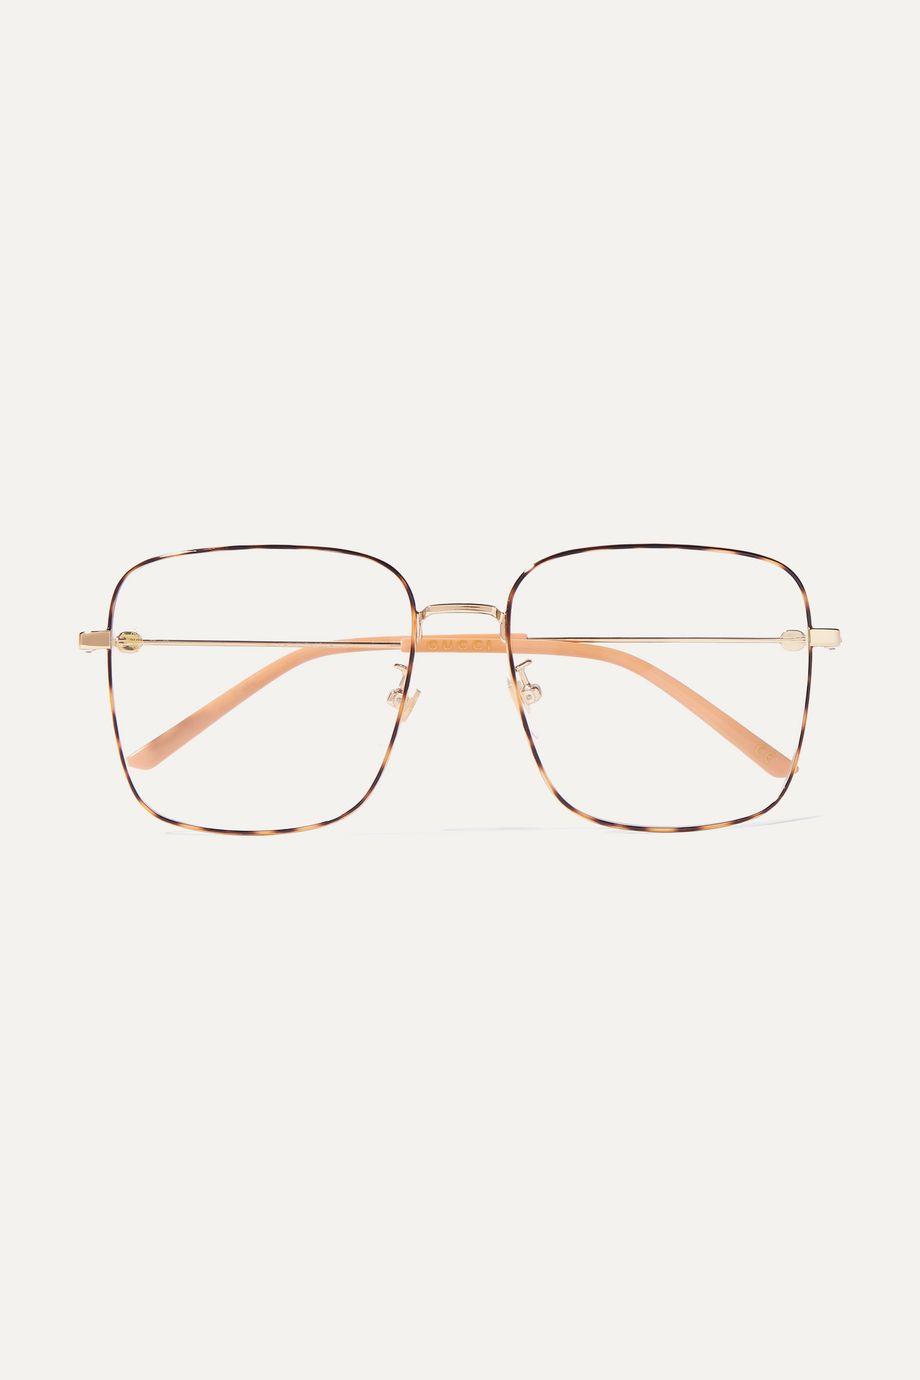 Gucci Square-frame gold-tone and tortoiseshell acetate optical glasses